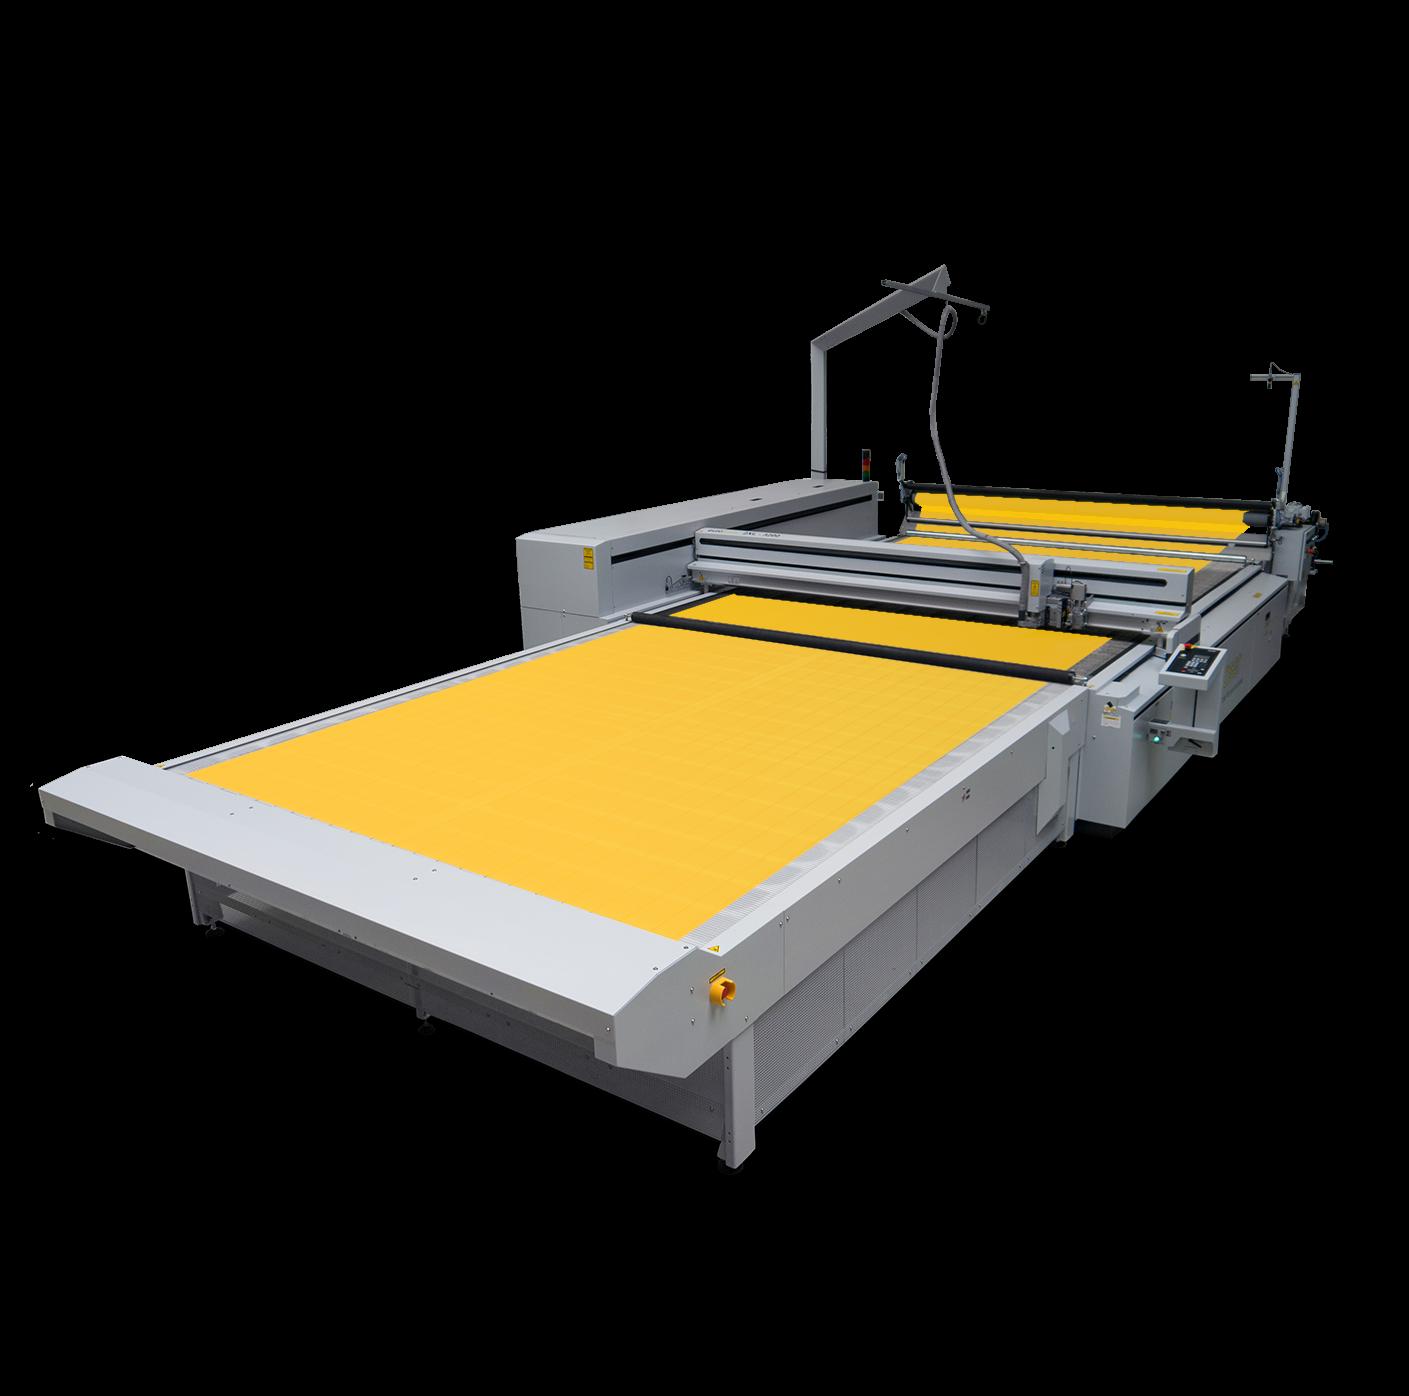 Conveyor Muster 300 dpi